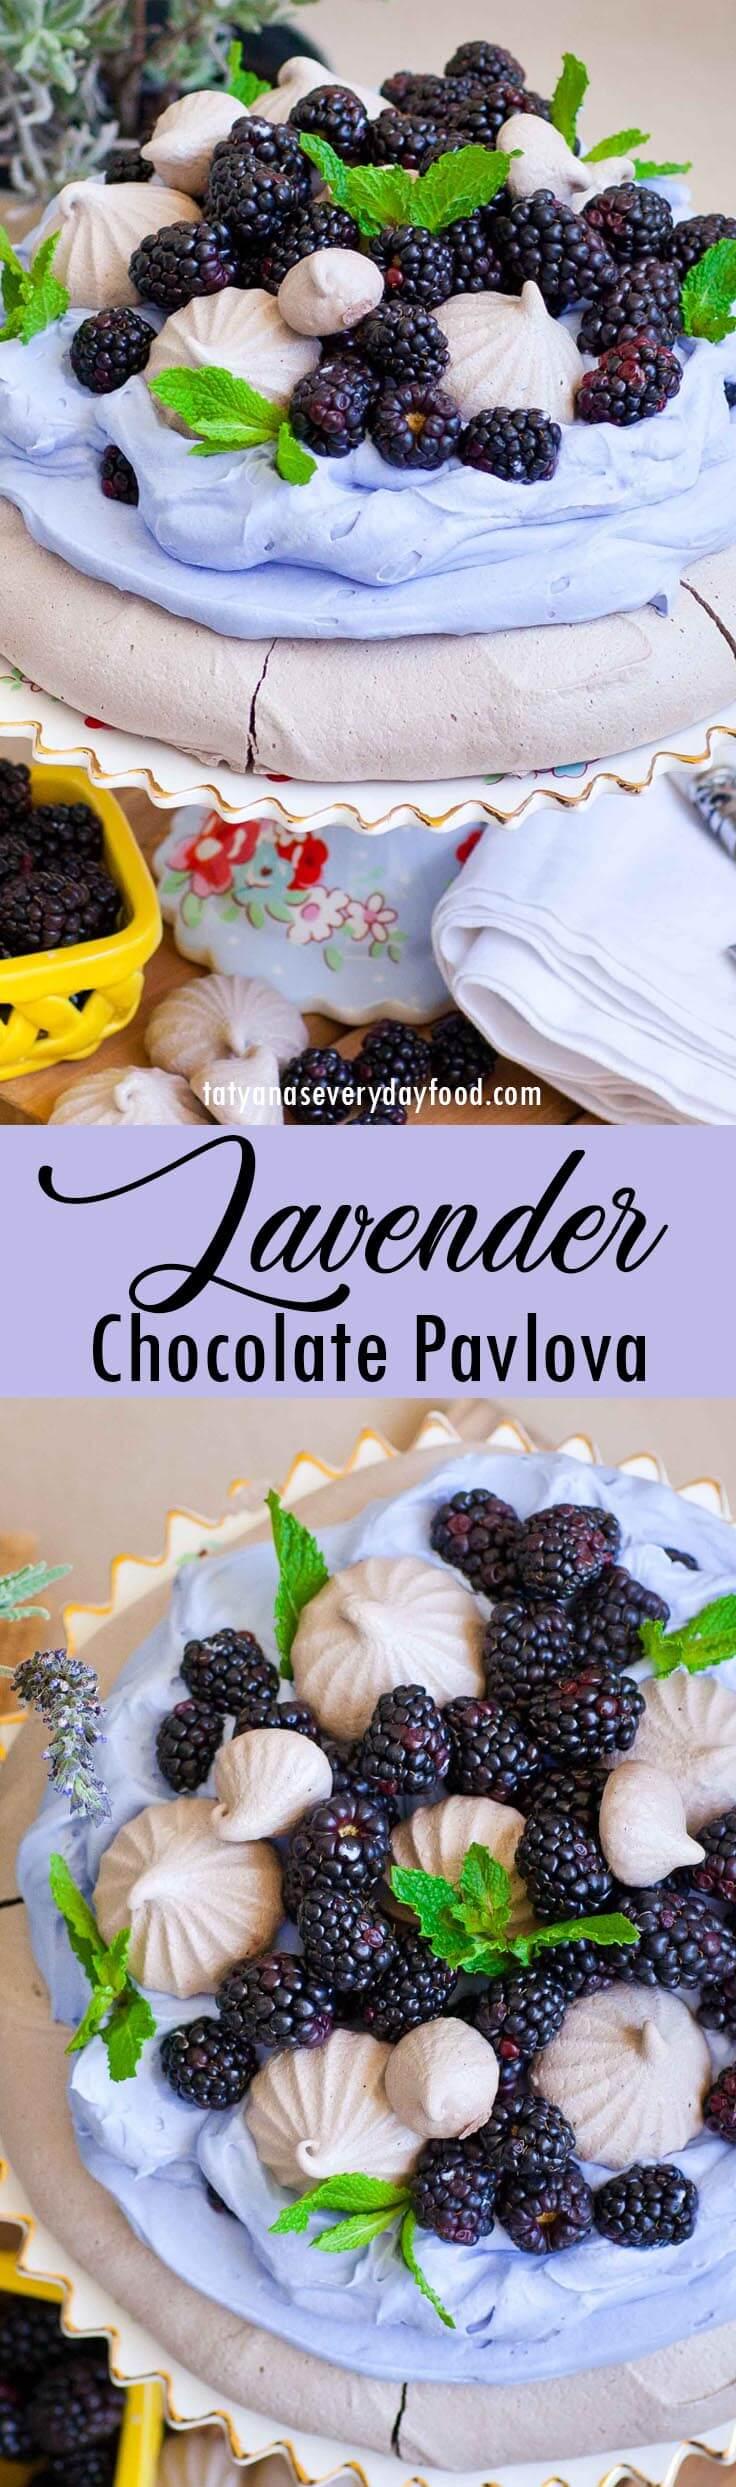 Lavender Chocolate Pavlova with video recipe